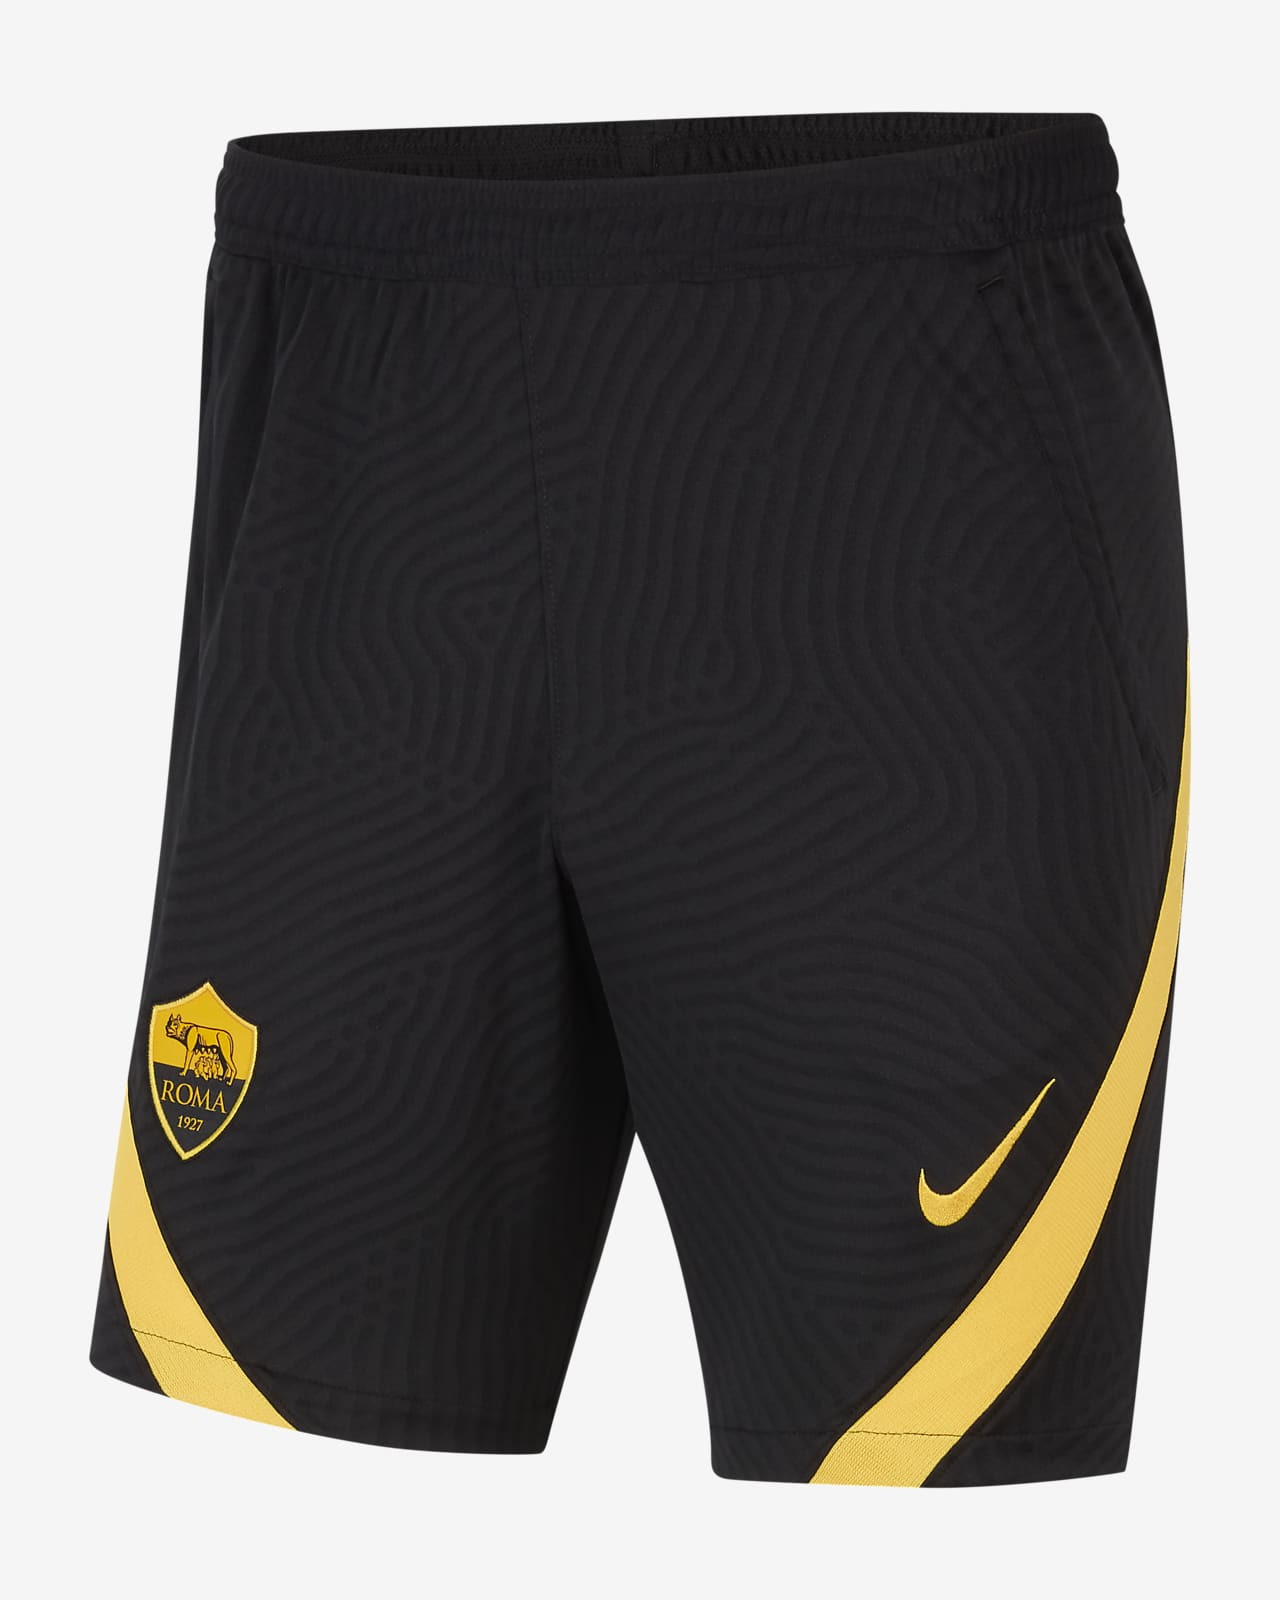 AS Roma Strike Men's Football Shorts